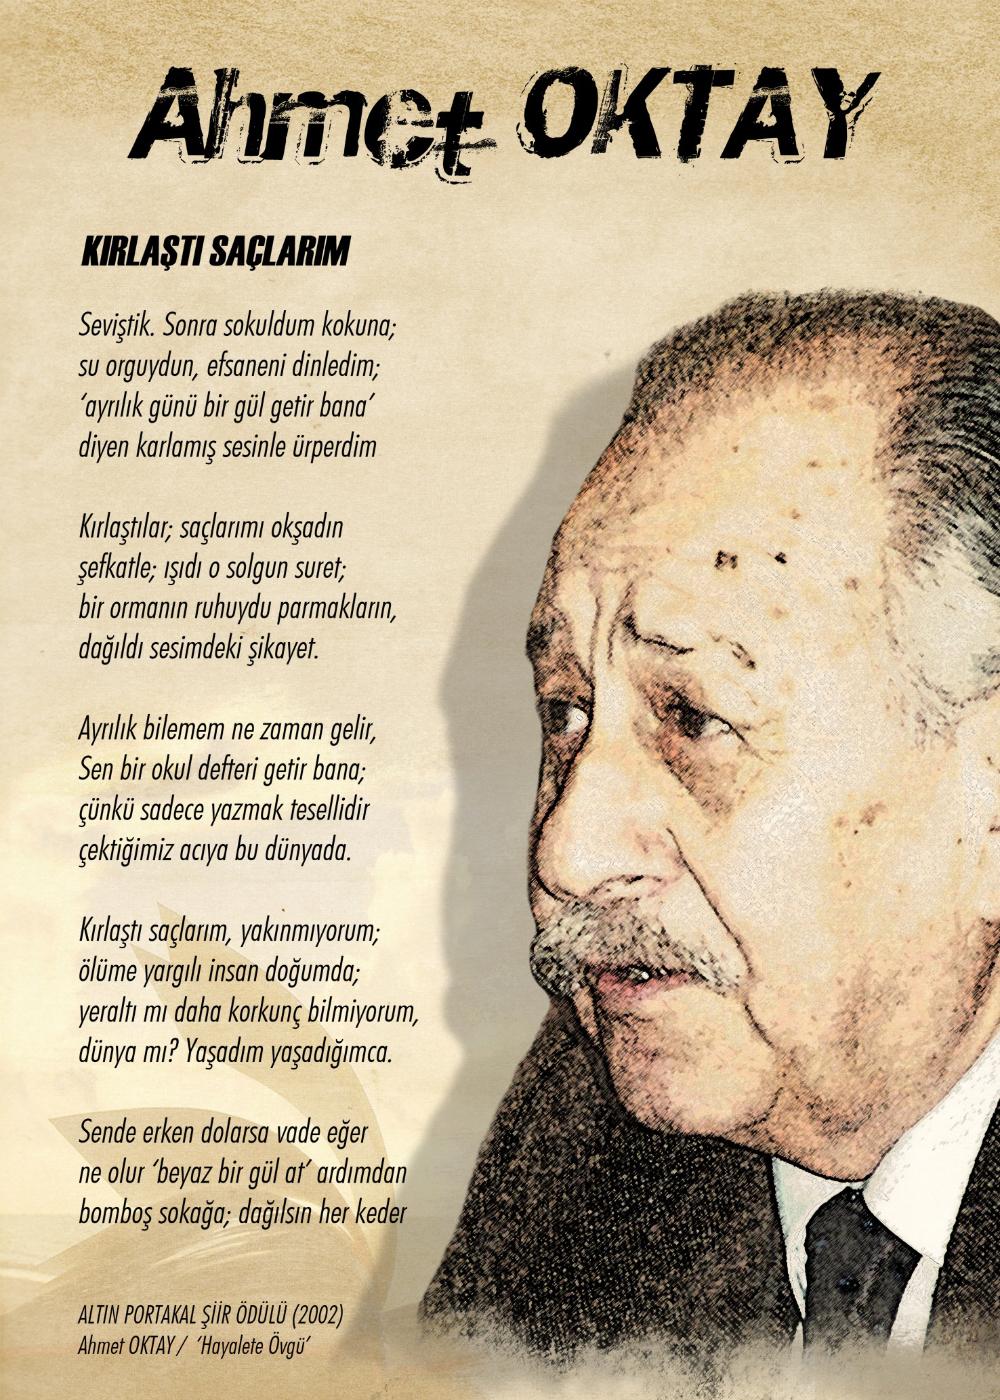 Enis Batur Sozleri Google Arama Edebiyat Siir Saga